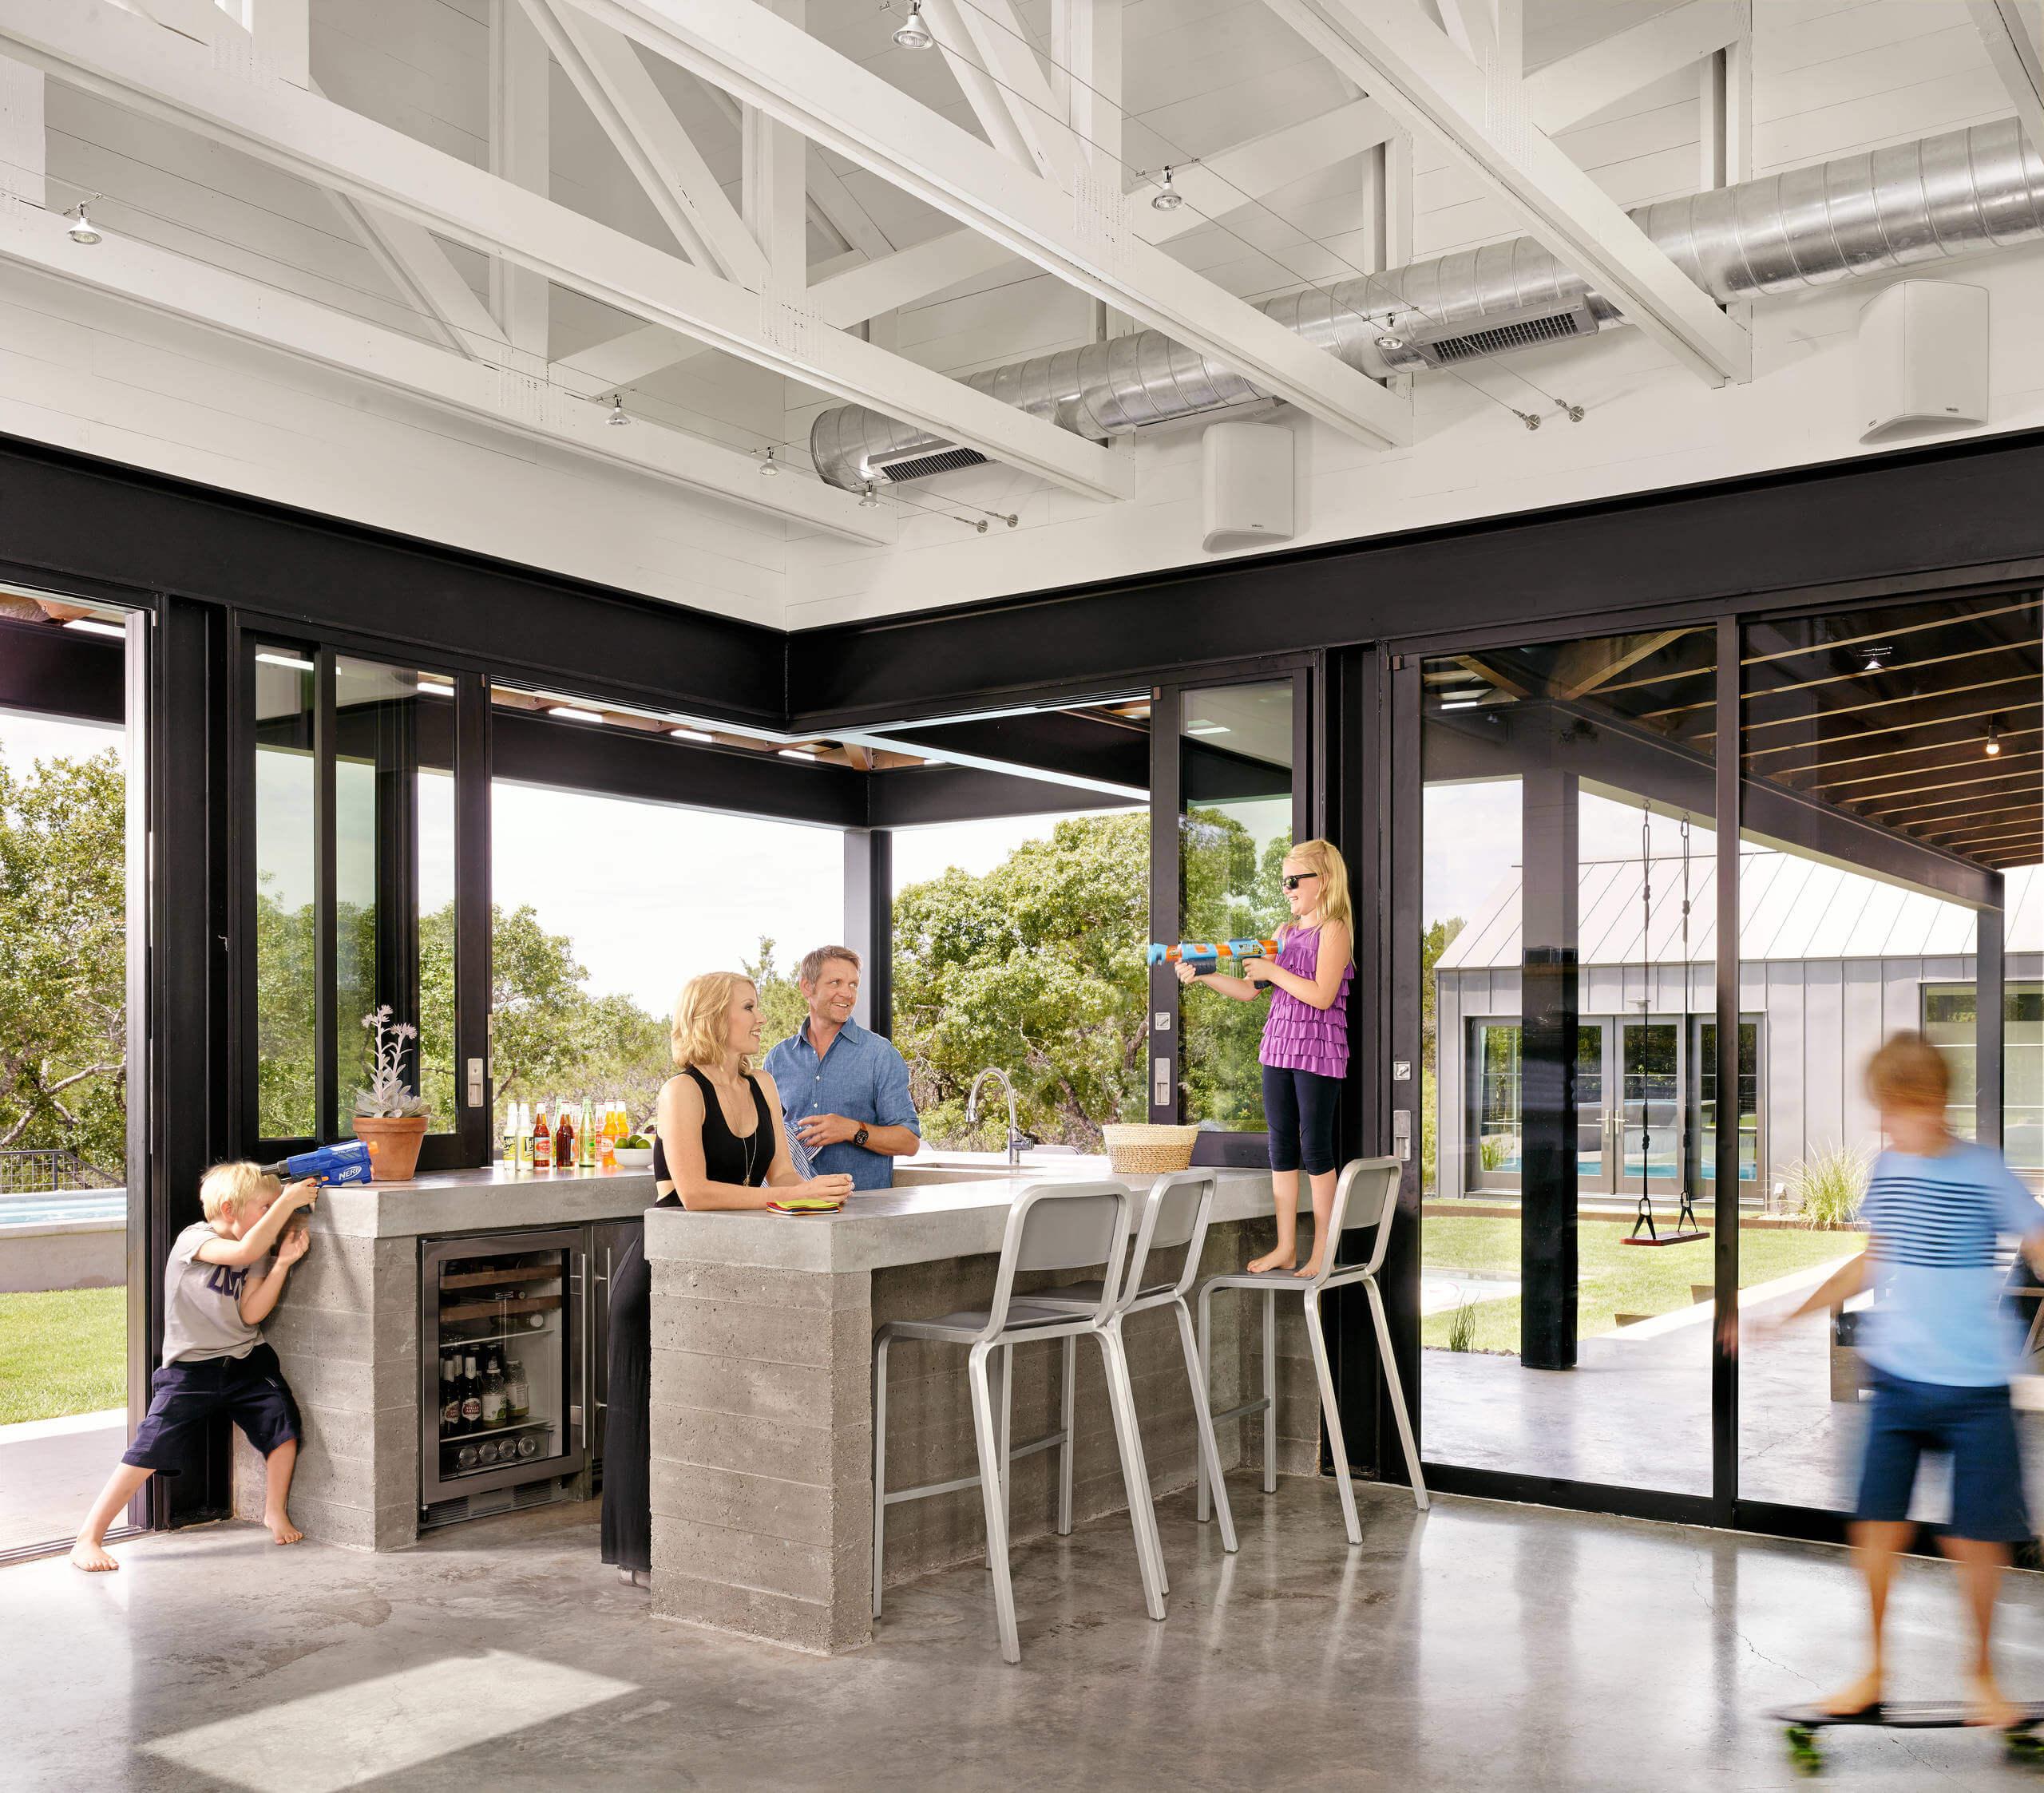 farmhouse-shiflet-group-architects-06